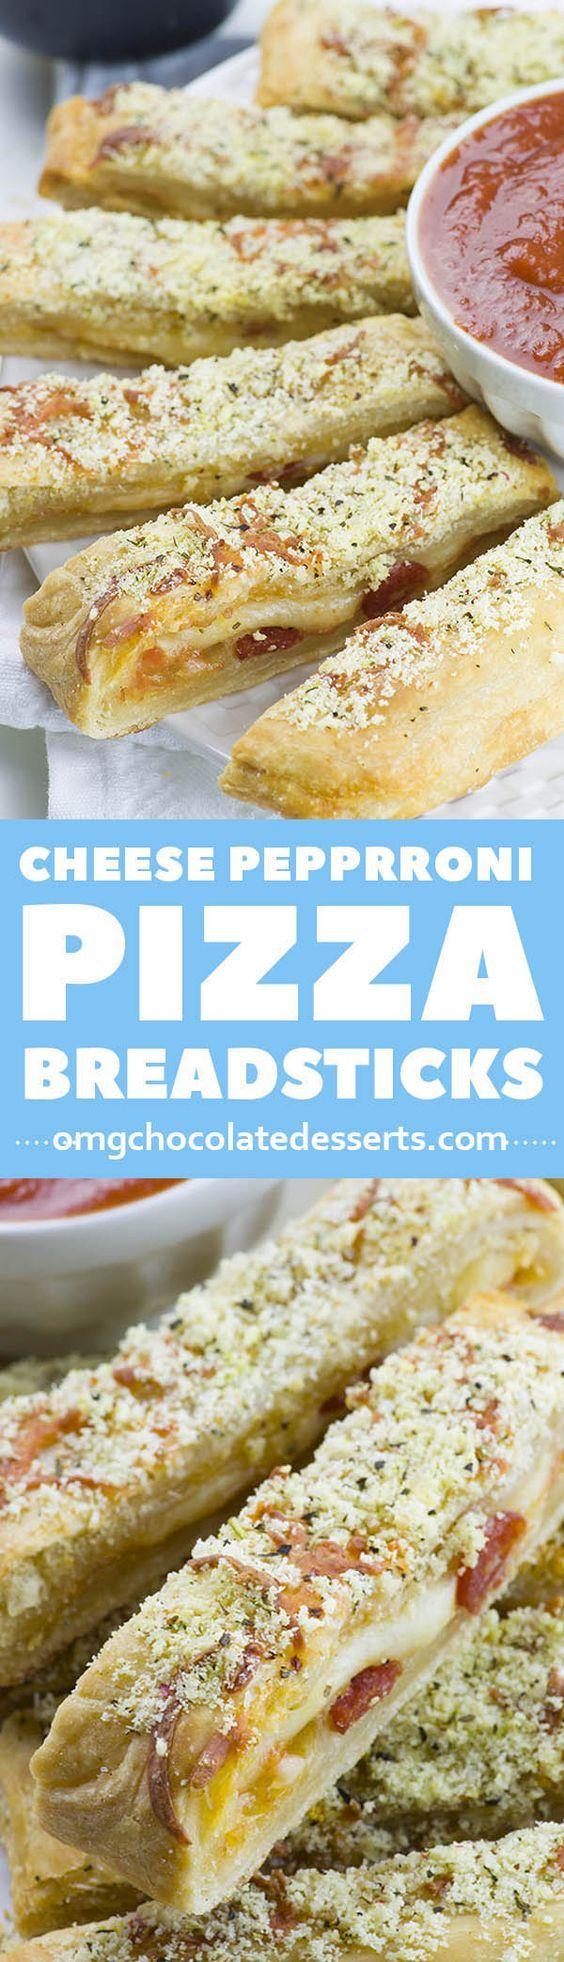 Easy Cheesy Pizza Breadsticks